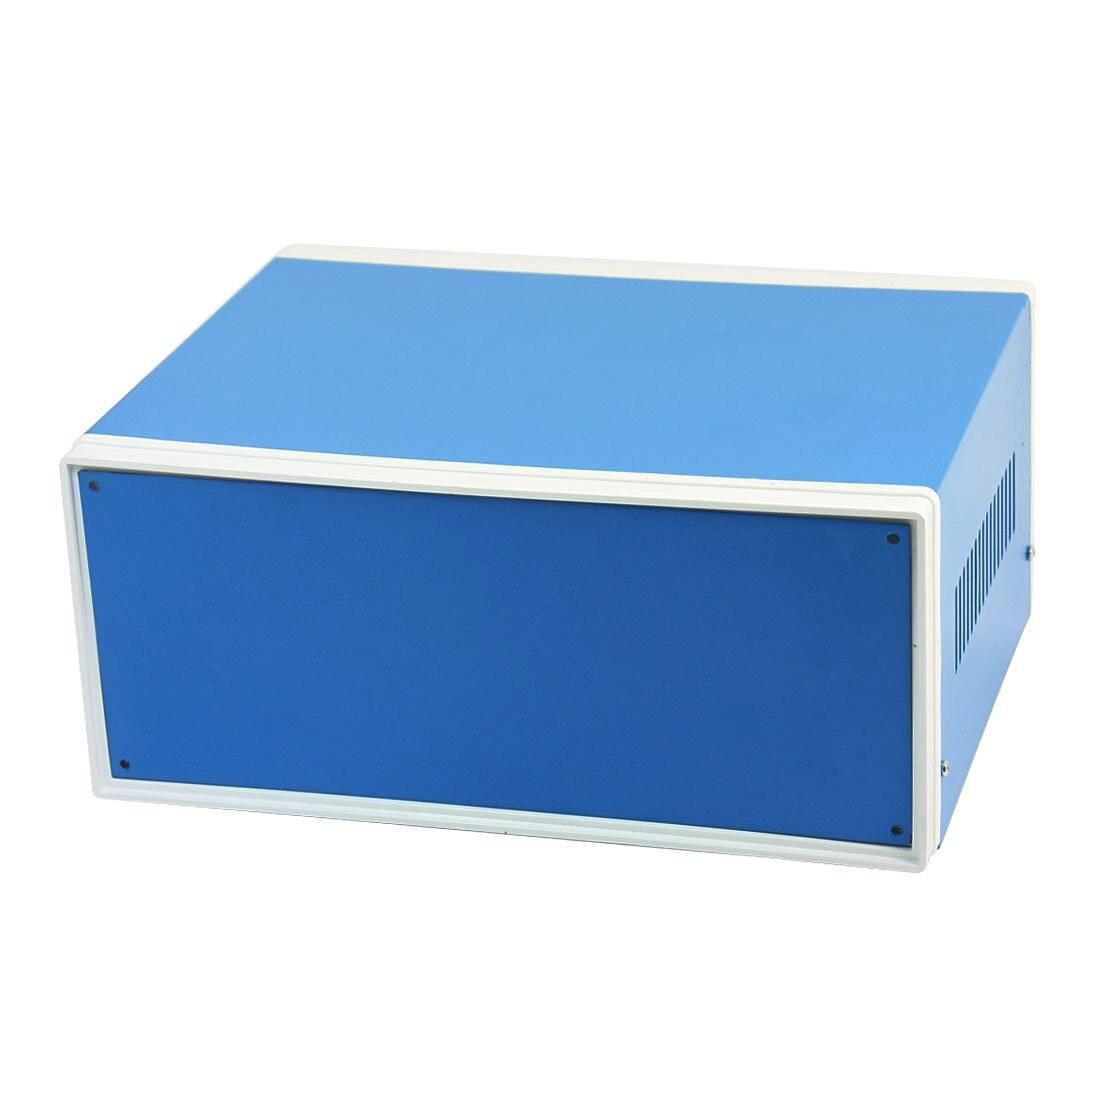 CNIM Hot 9.8 x 7.5 x 4.3 Blue Metal Enclosure Project Case DIY Junction Box